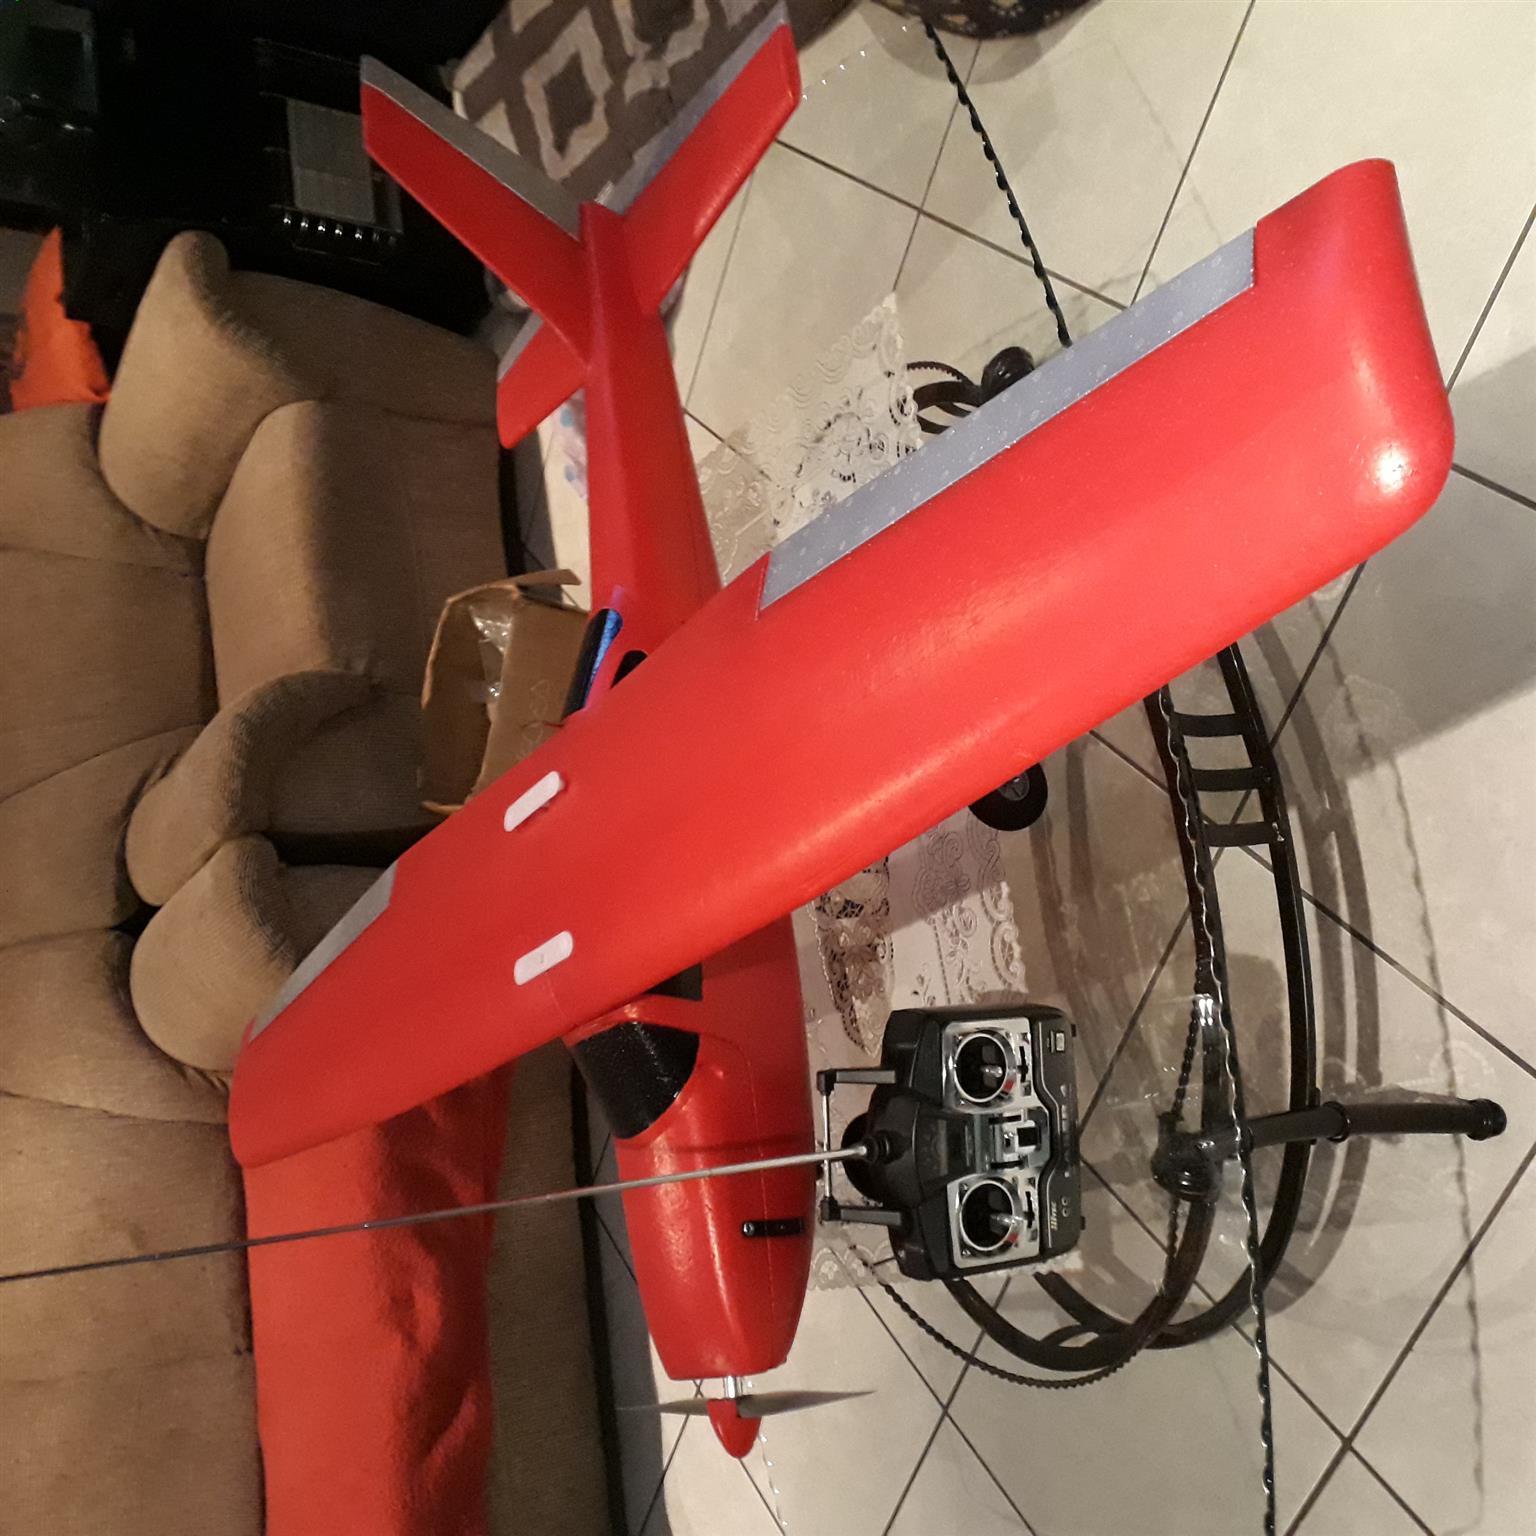 Electric Radio control plane